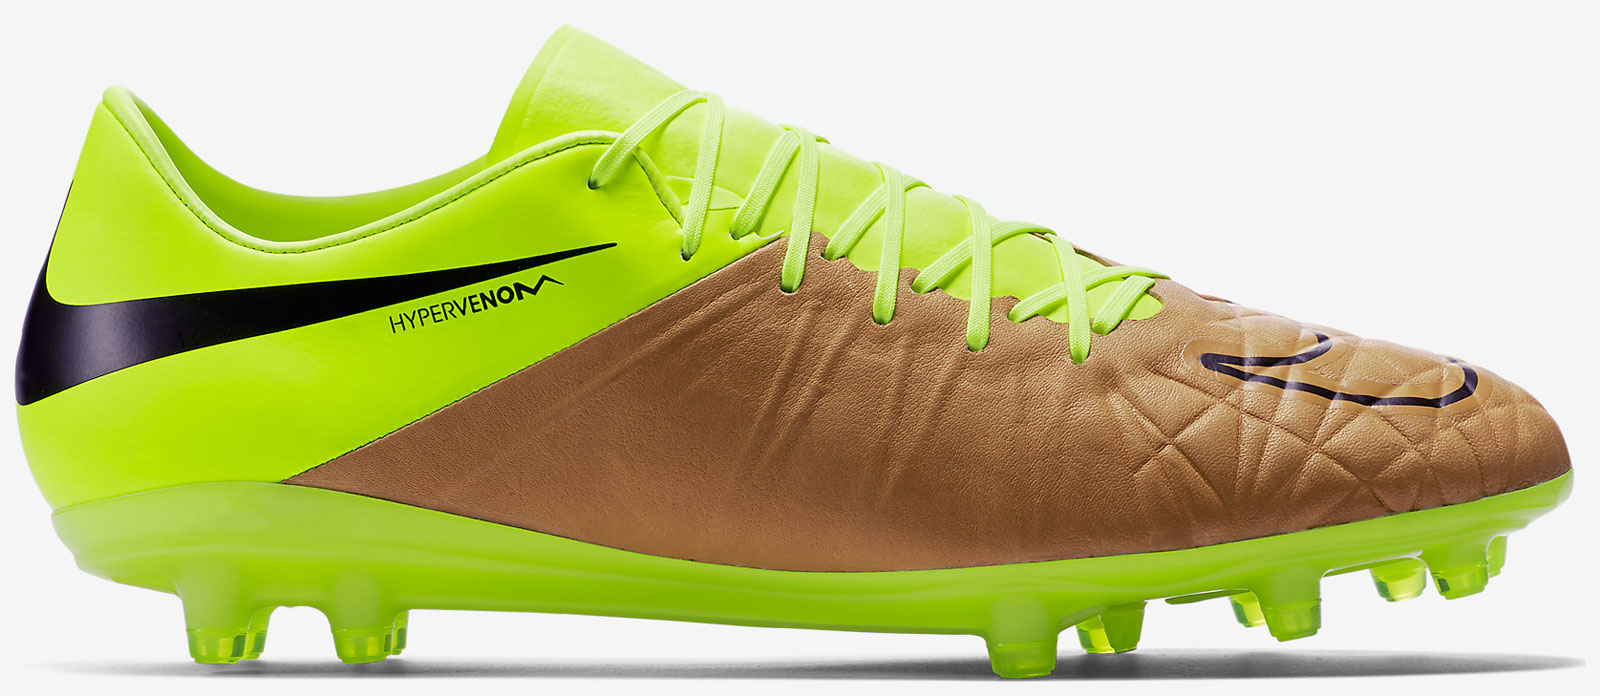 chaussures de séparation 3c7dd 1b70d nike hypervenom phinish 2 gold